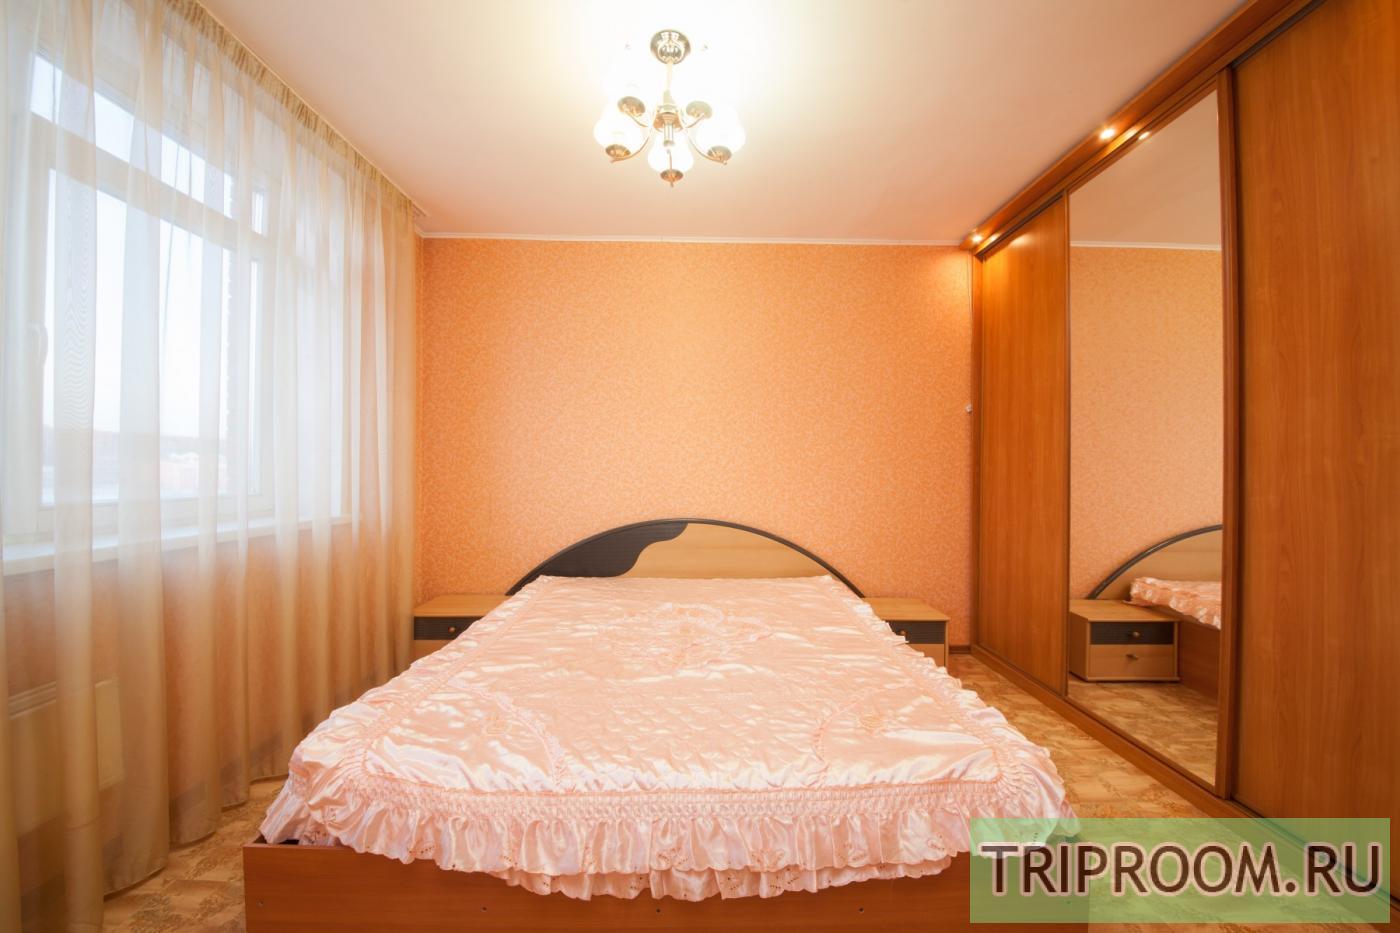 1-комнатная квартира посуточно (вариант № 35185), ул. Алексеева улица, фото № 2